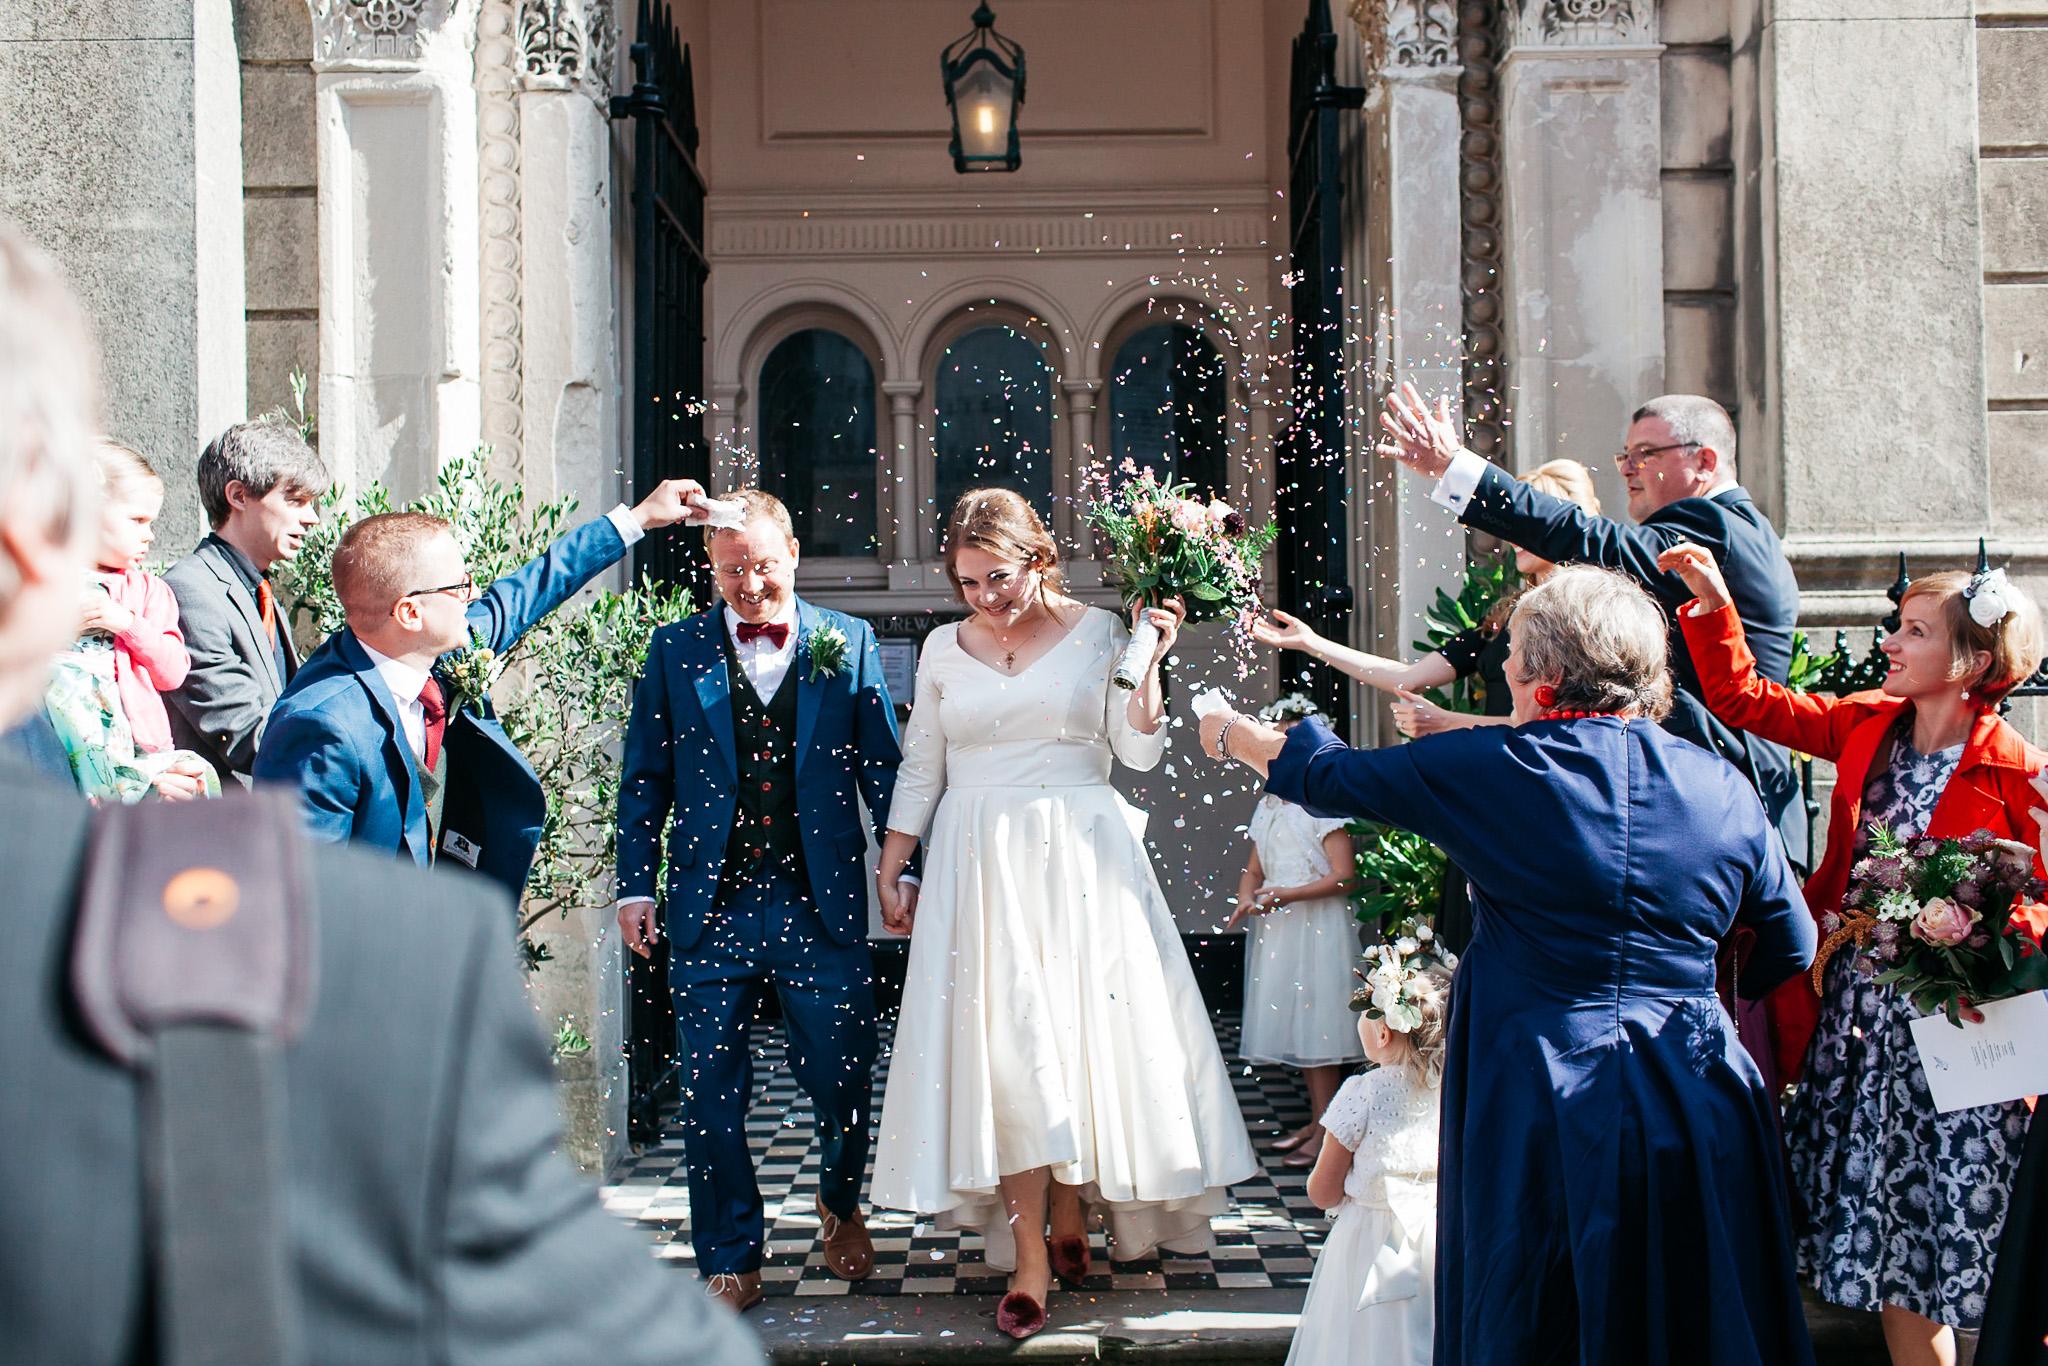 st_andrews_fabrica_brighton_wedding_567.jpg